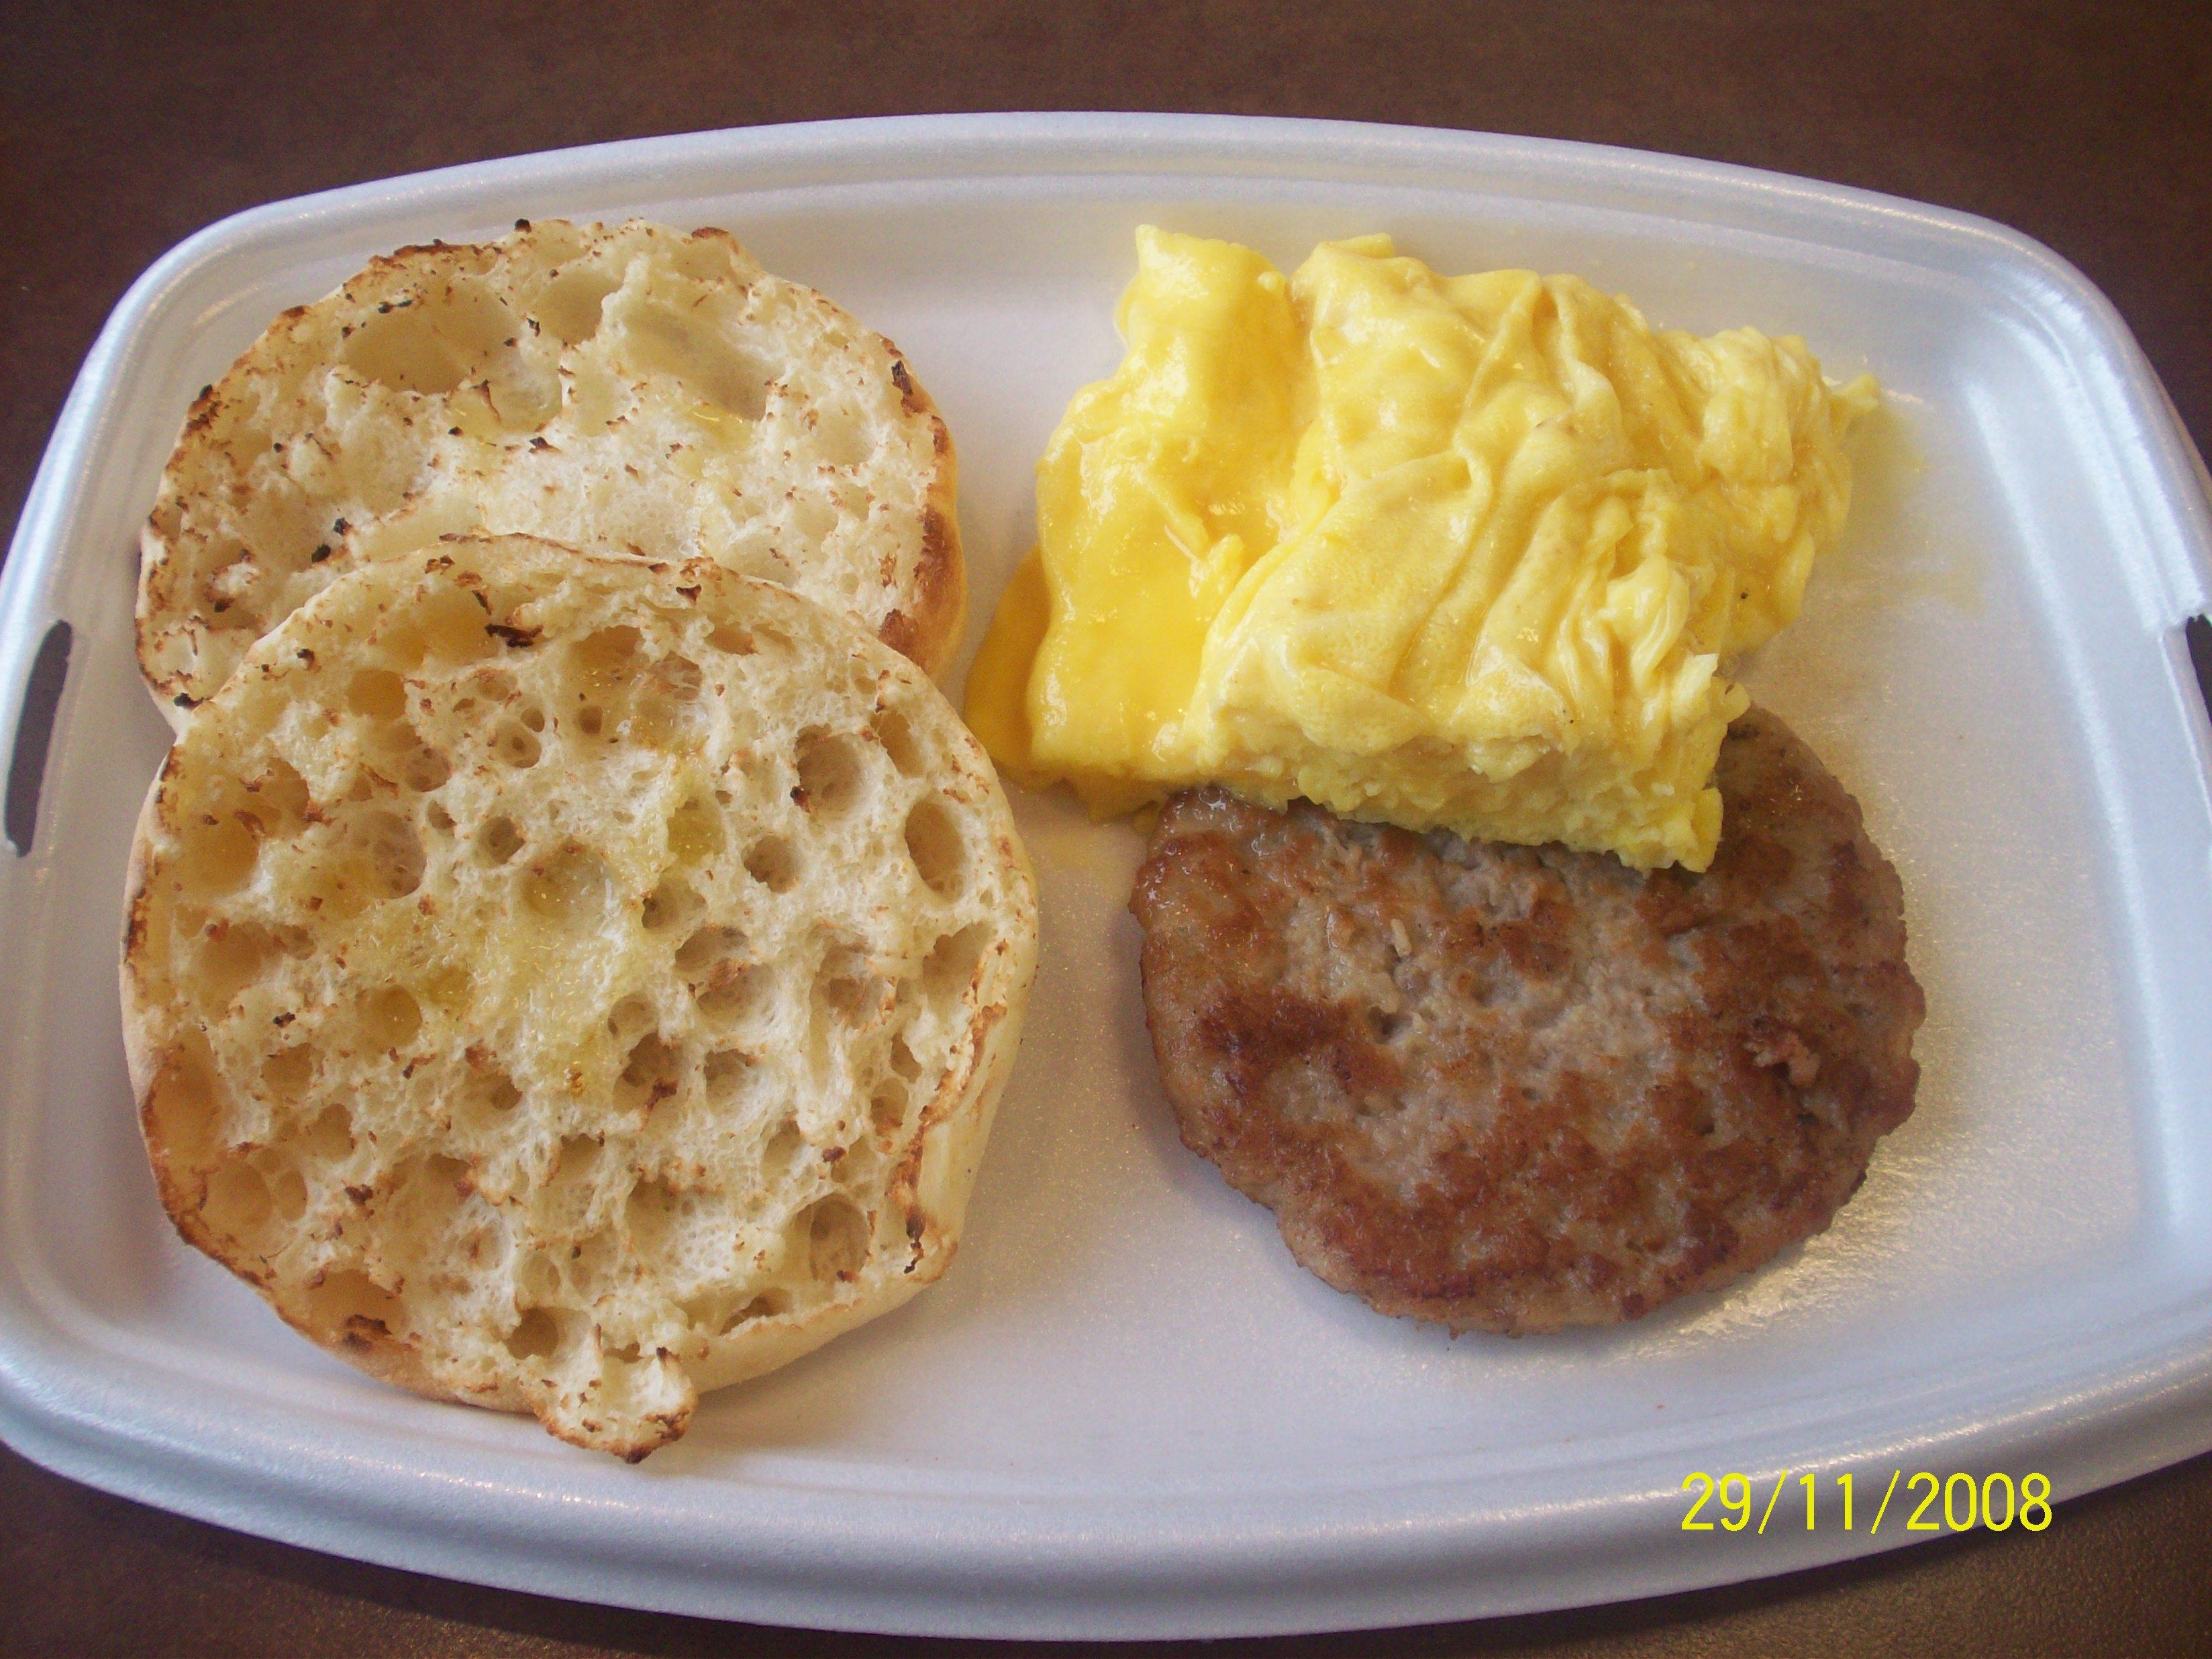 https://foodloader.net/cutie_2008-11-29_McDos_Big_Breakfast.jpg